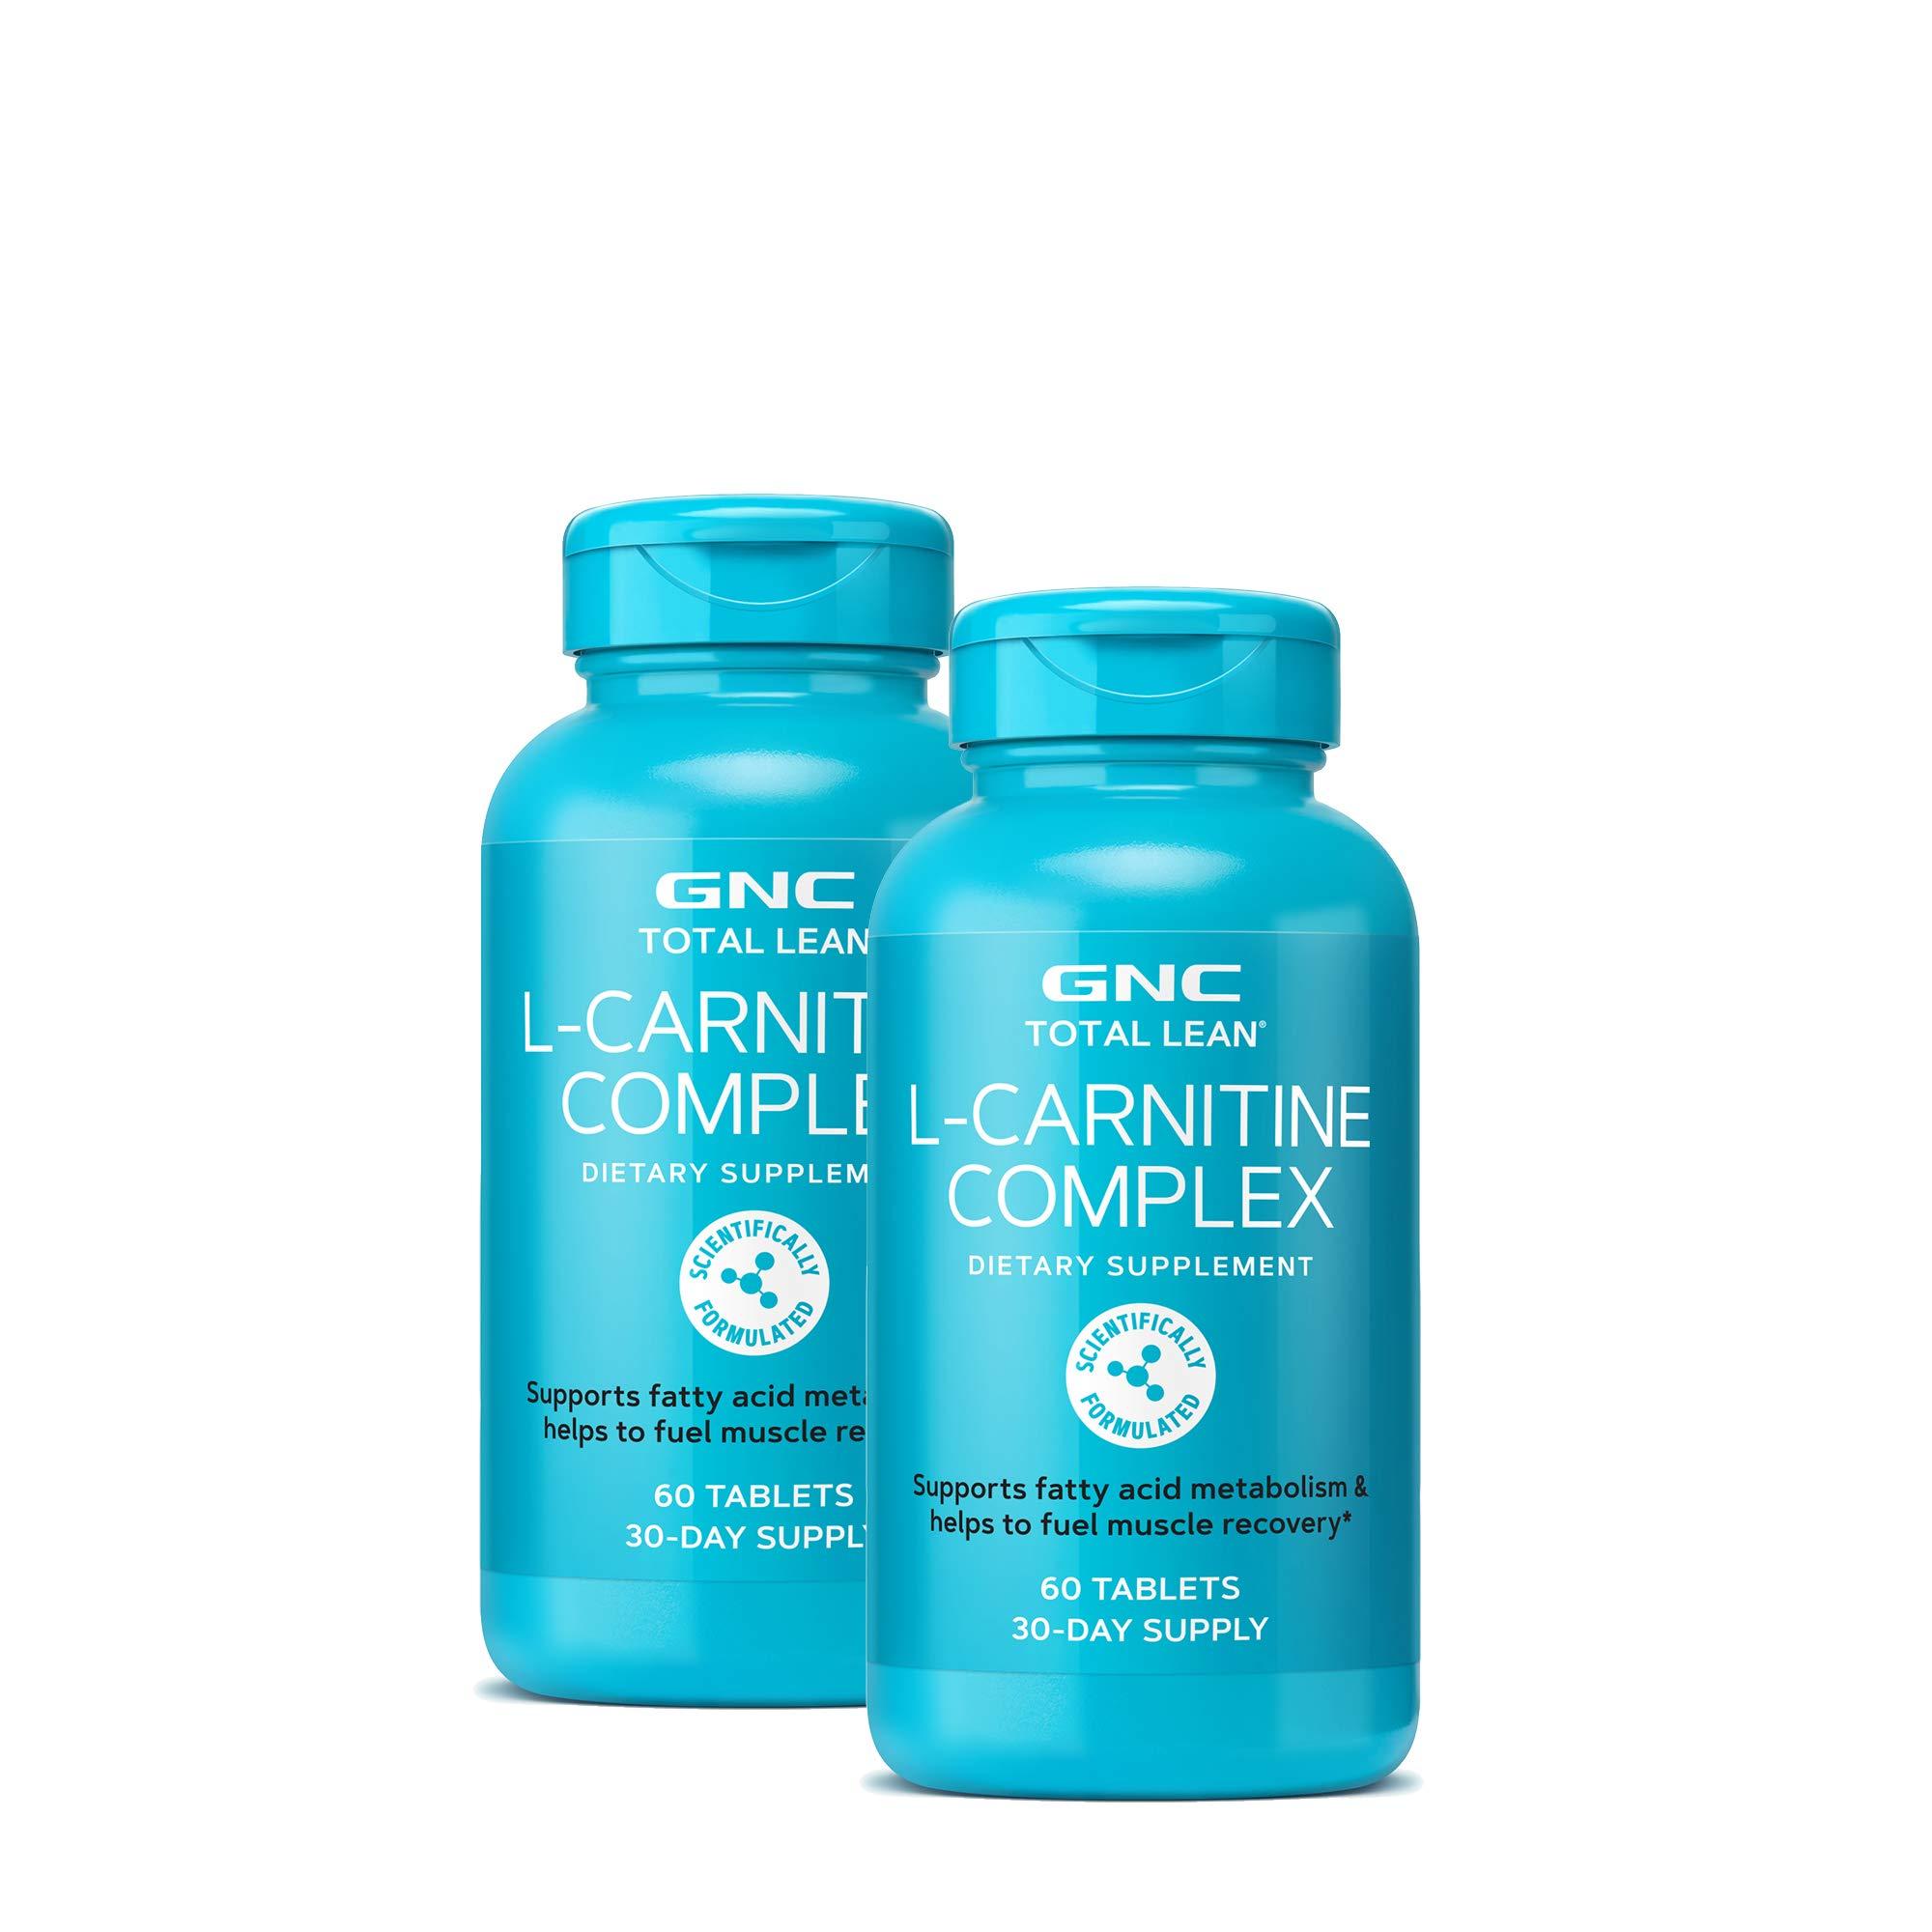 GNC Total Lean L-Carnitine Complex - Twin Pack